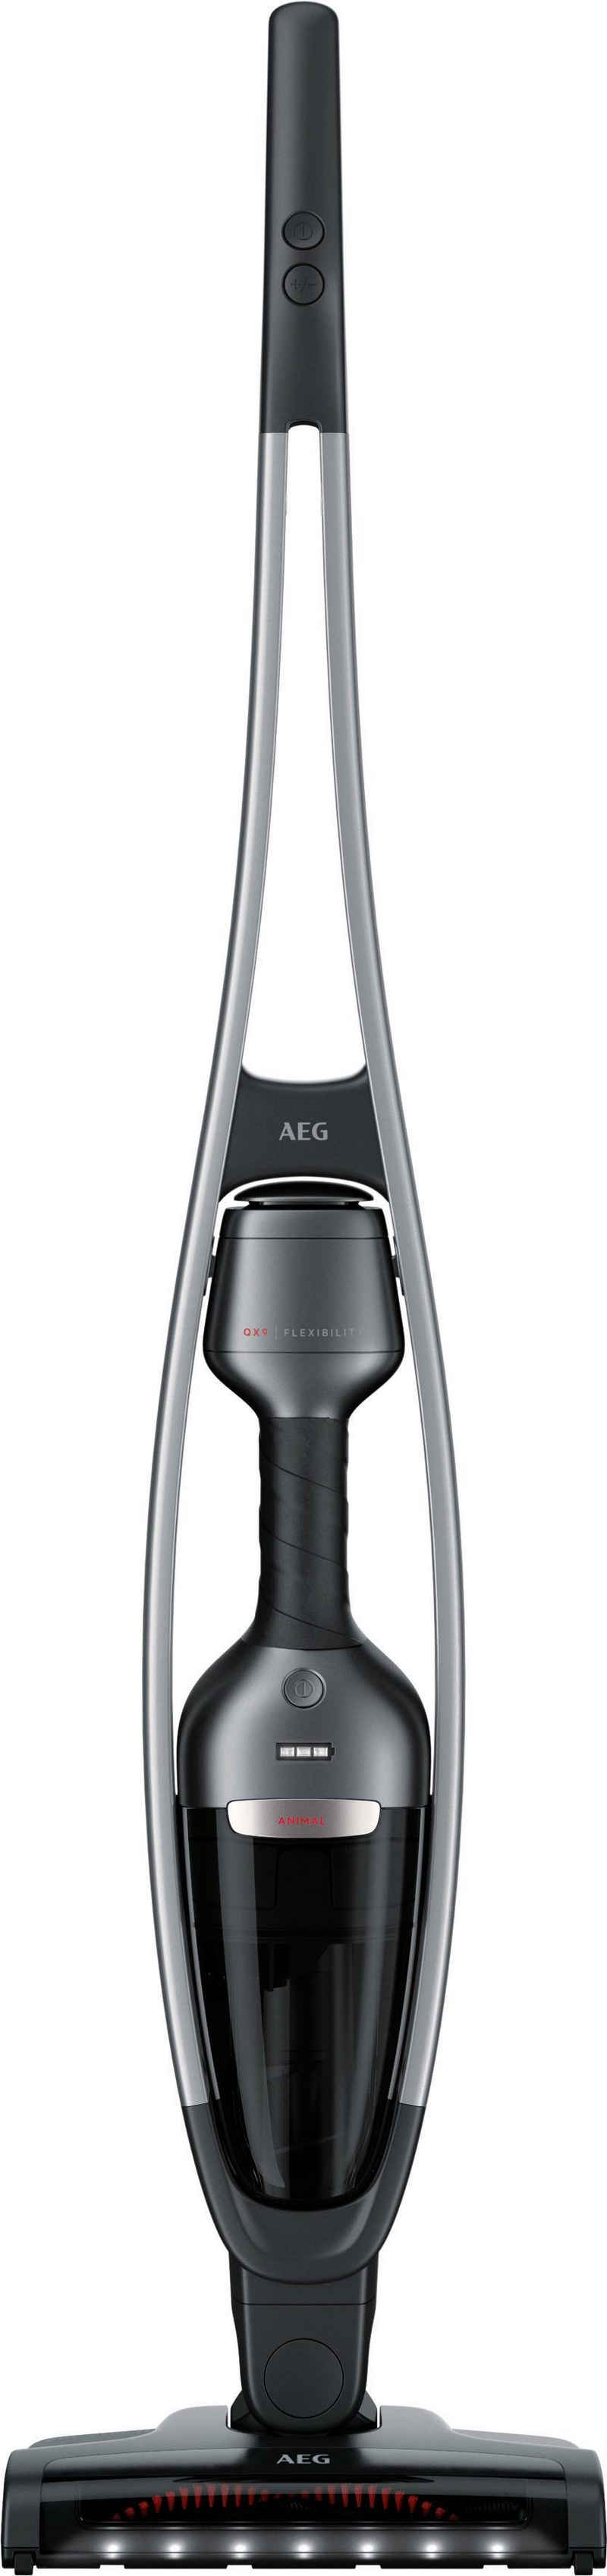 AEG Akku-Bodenstaubsauger QX9-1-ANIM, beutellos